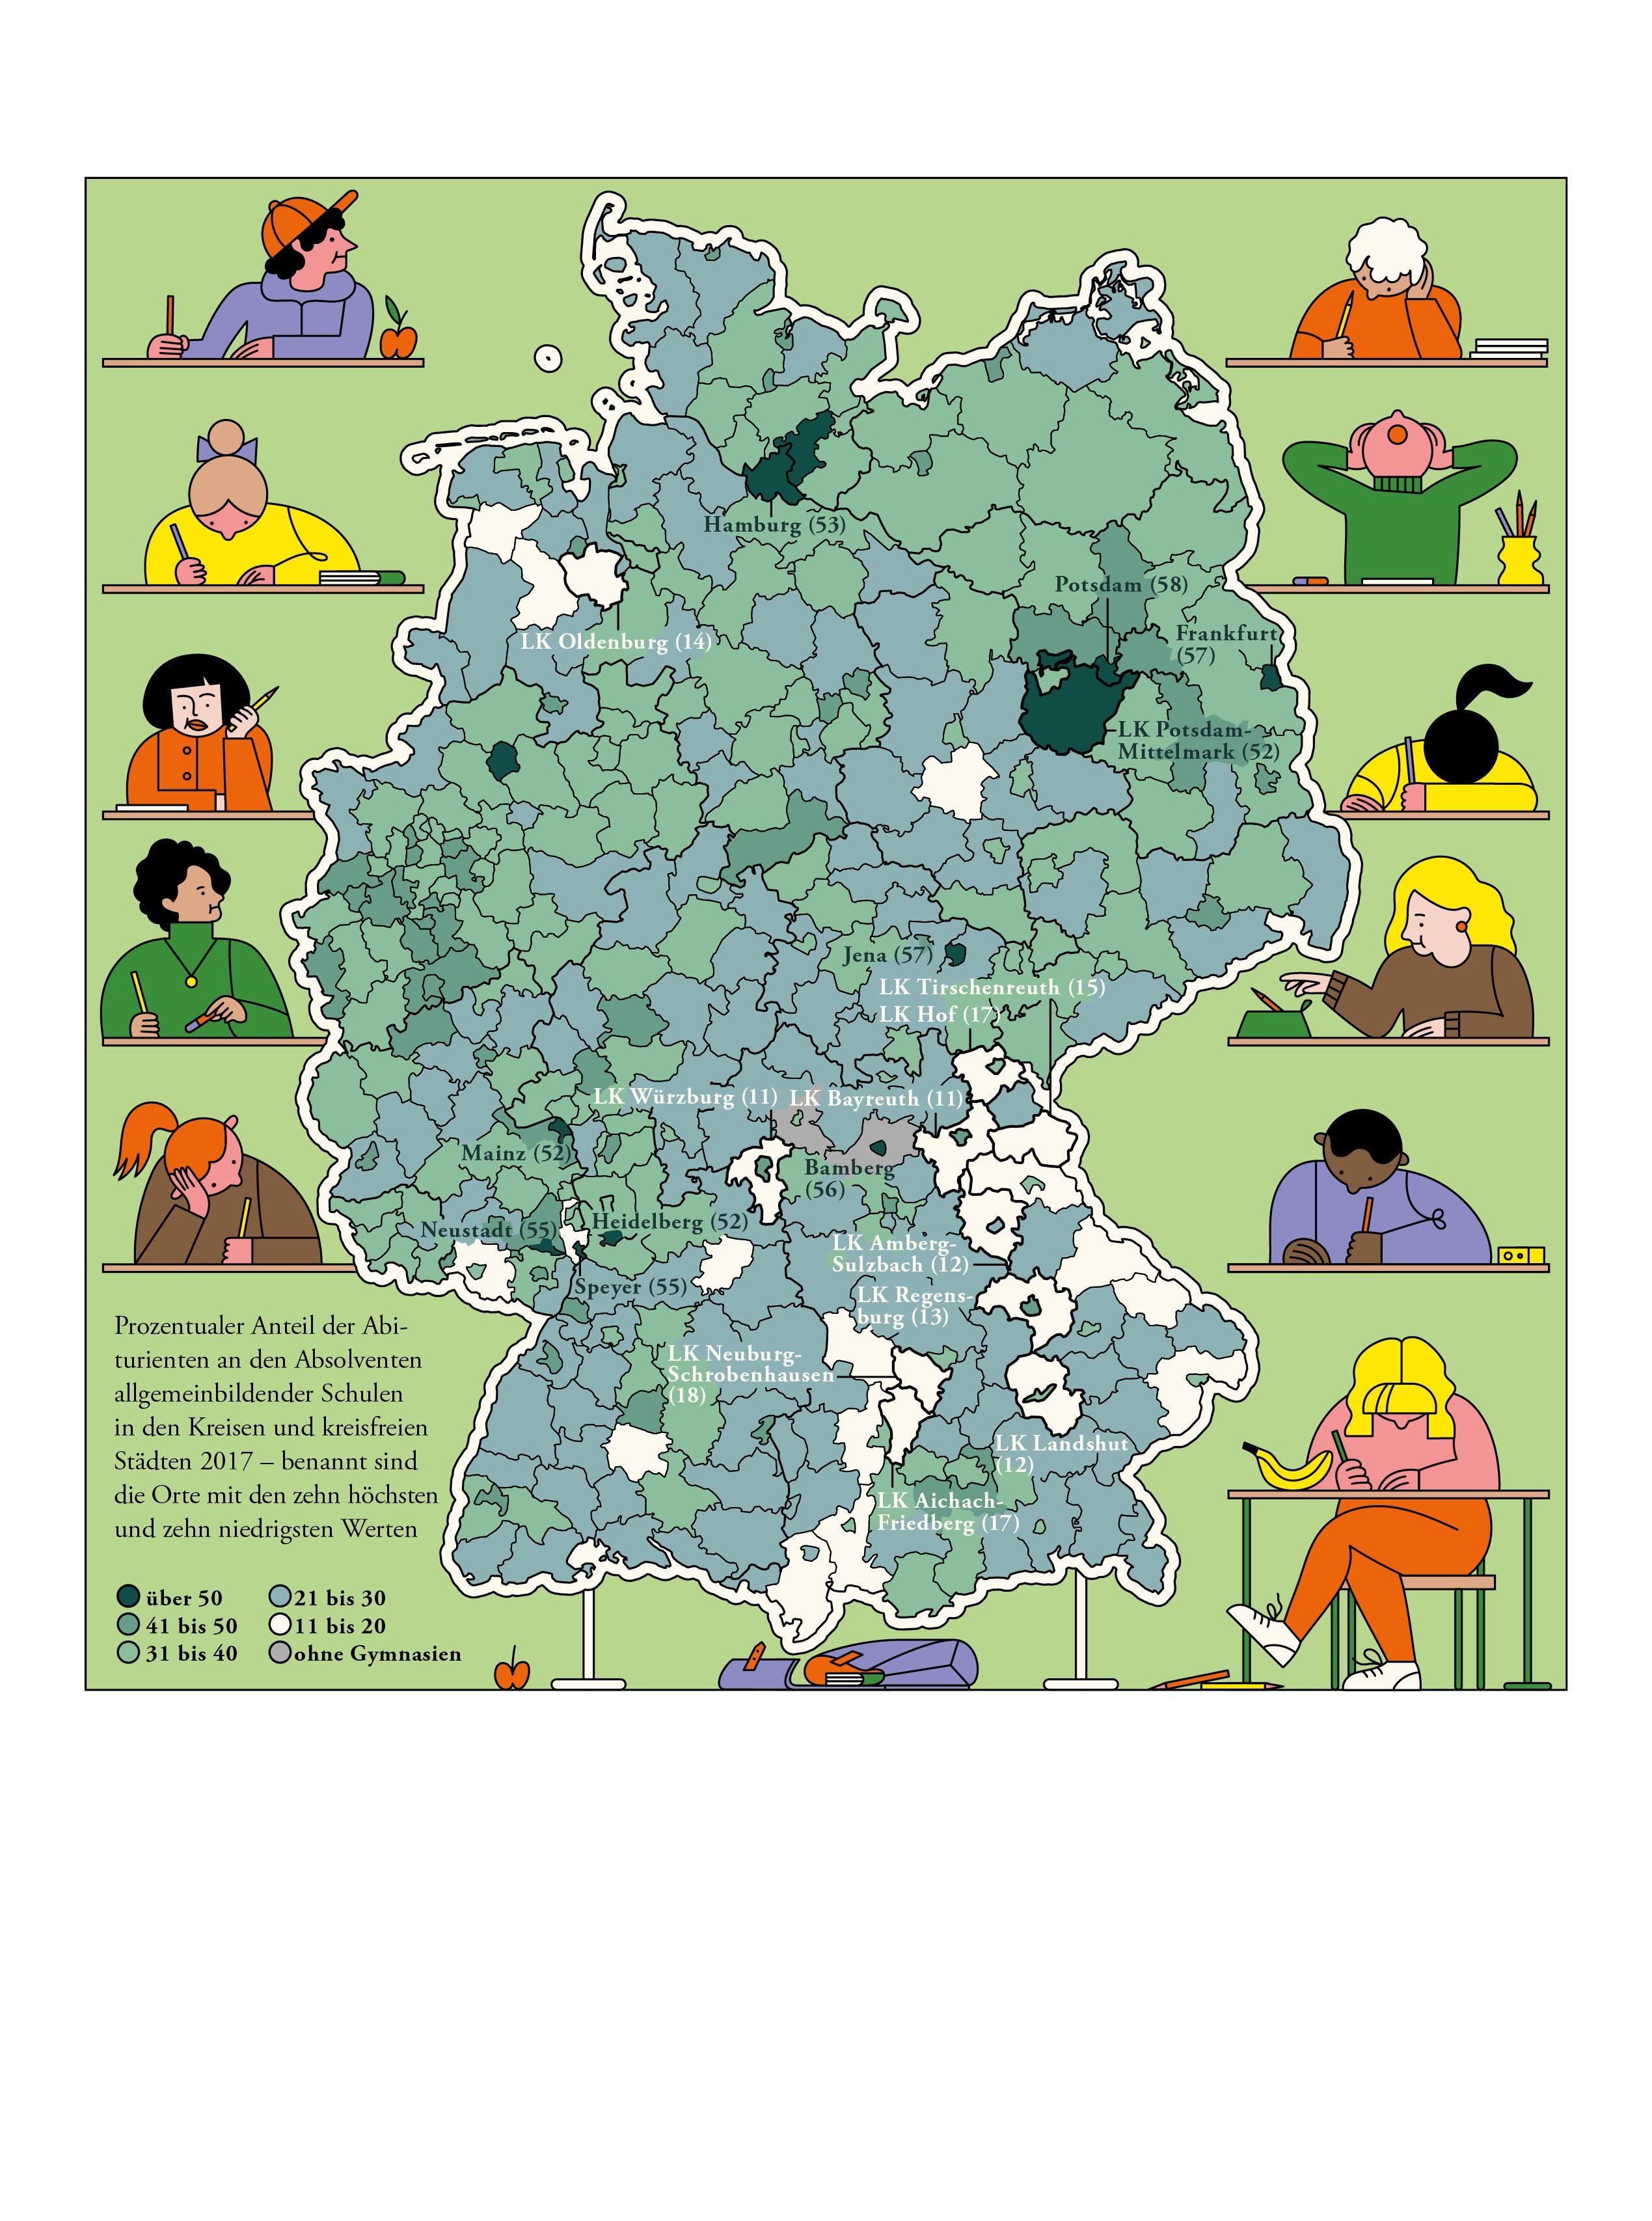 15 Deutschlandkarte Abiturientenquote Map Comics Map Screenshot